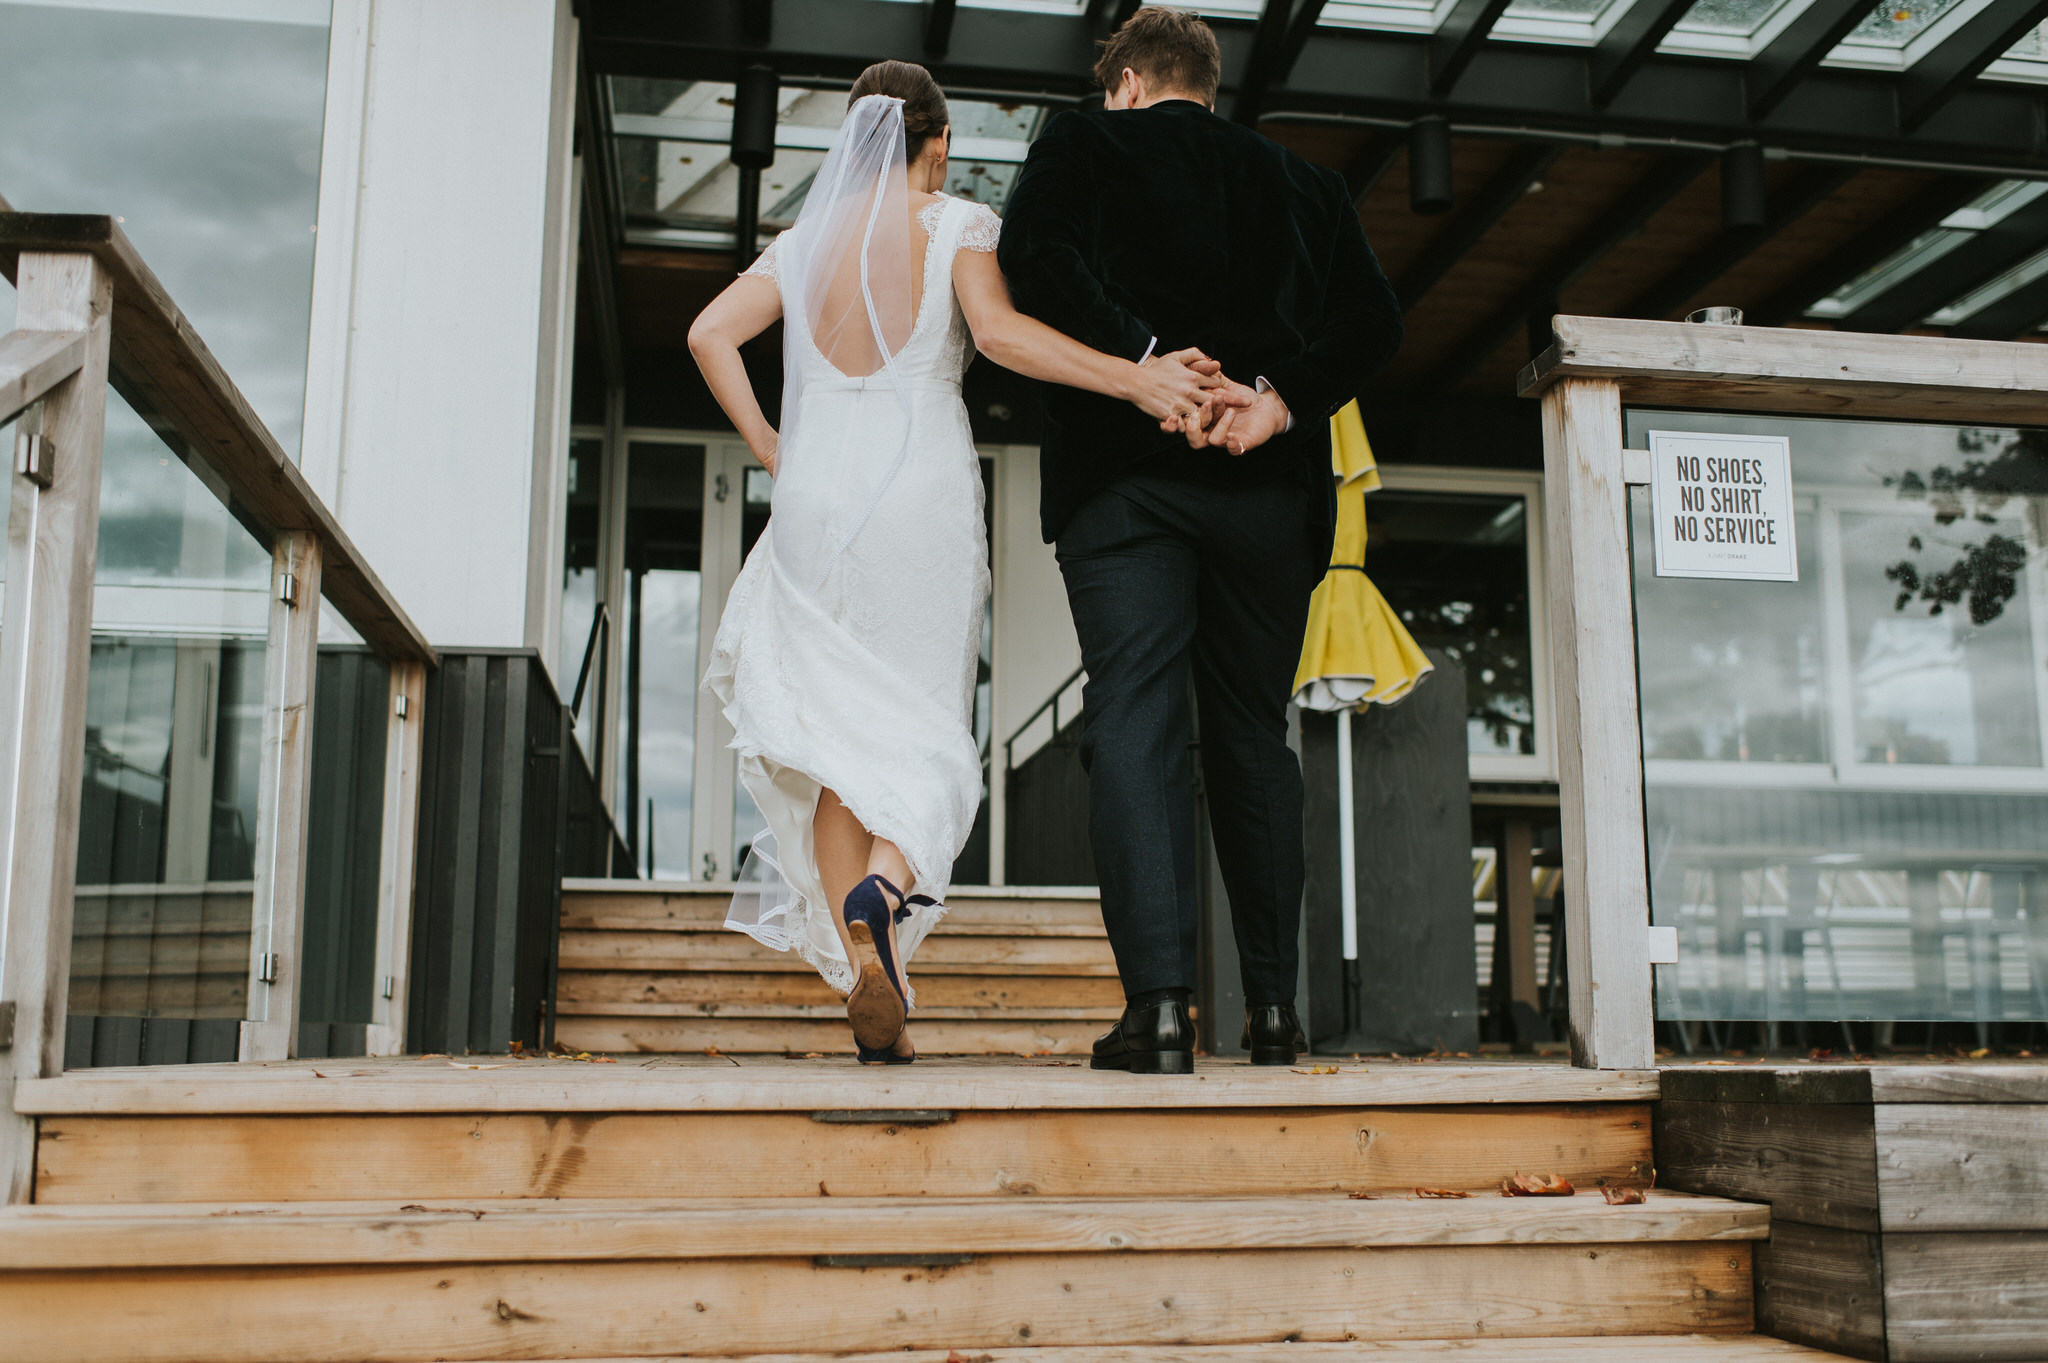 scarletoneillphotography_weddingphotography_prince edward county weddings046.JPG